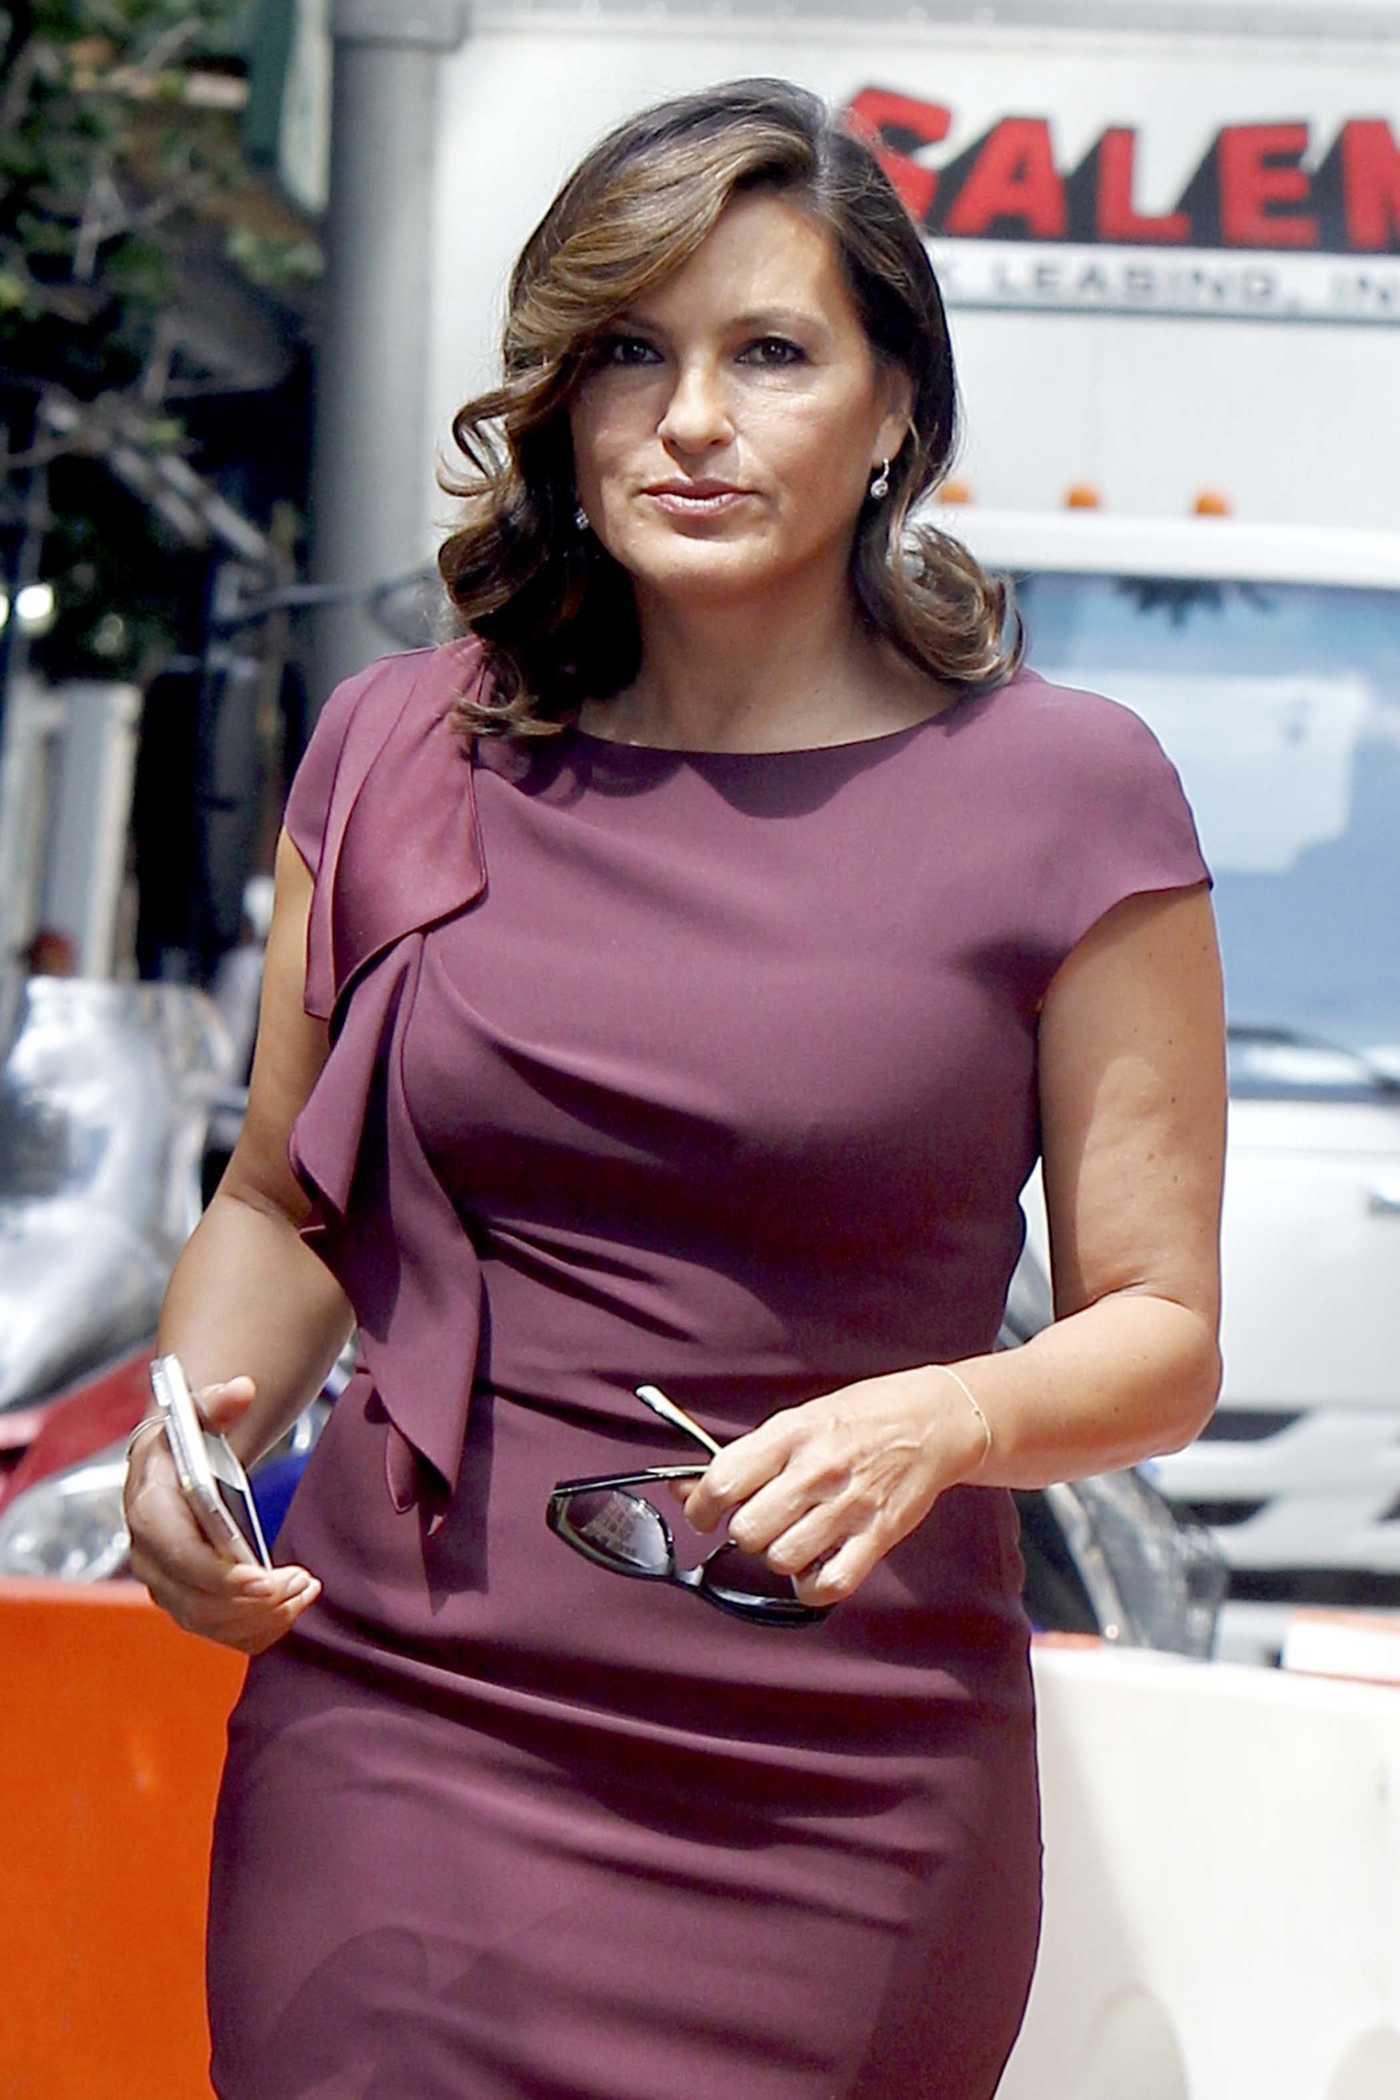 Mariska Hargitay at the Set of Law and Order in Uptown Manhattan 08/30/2016